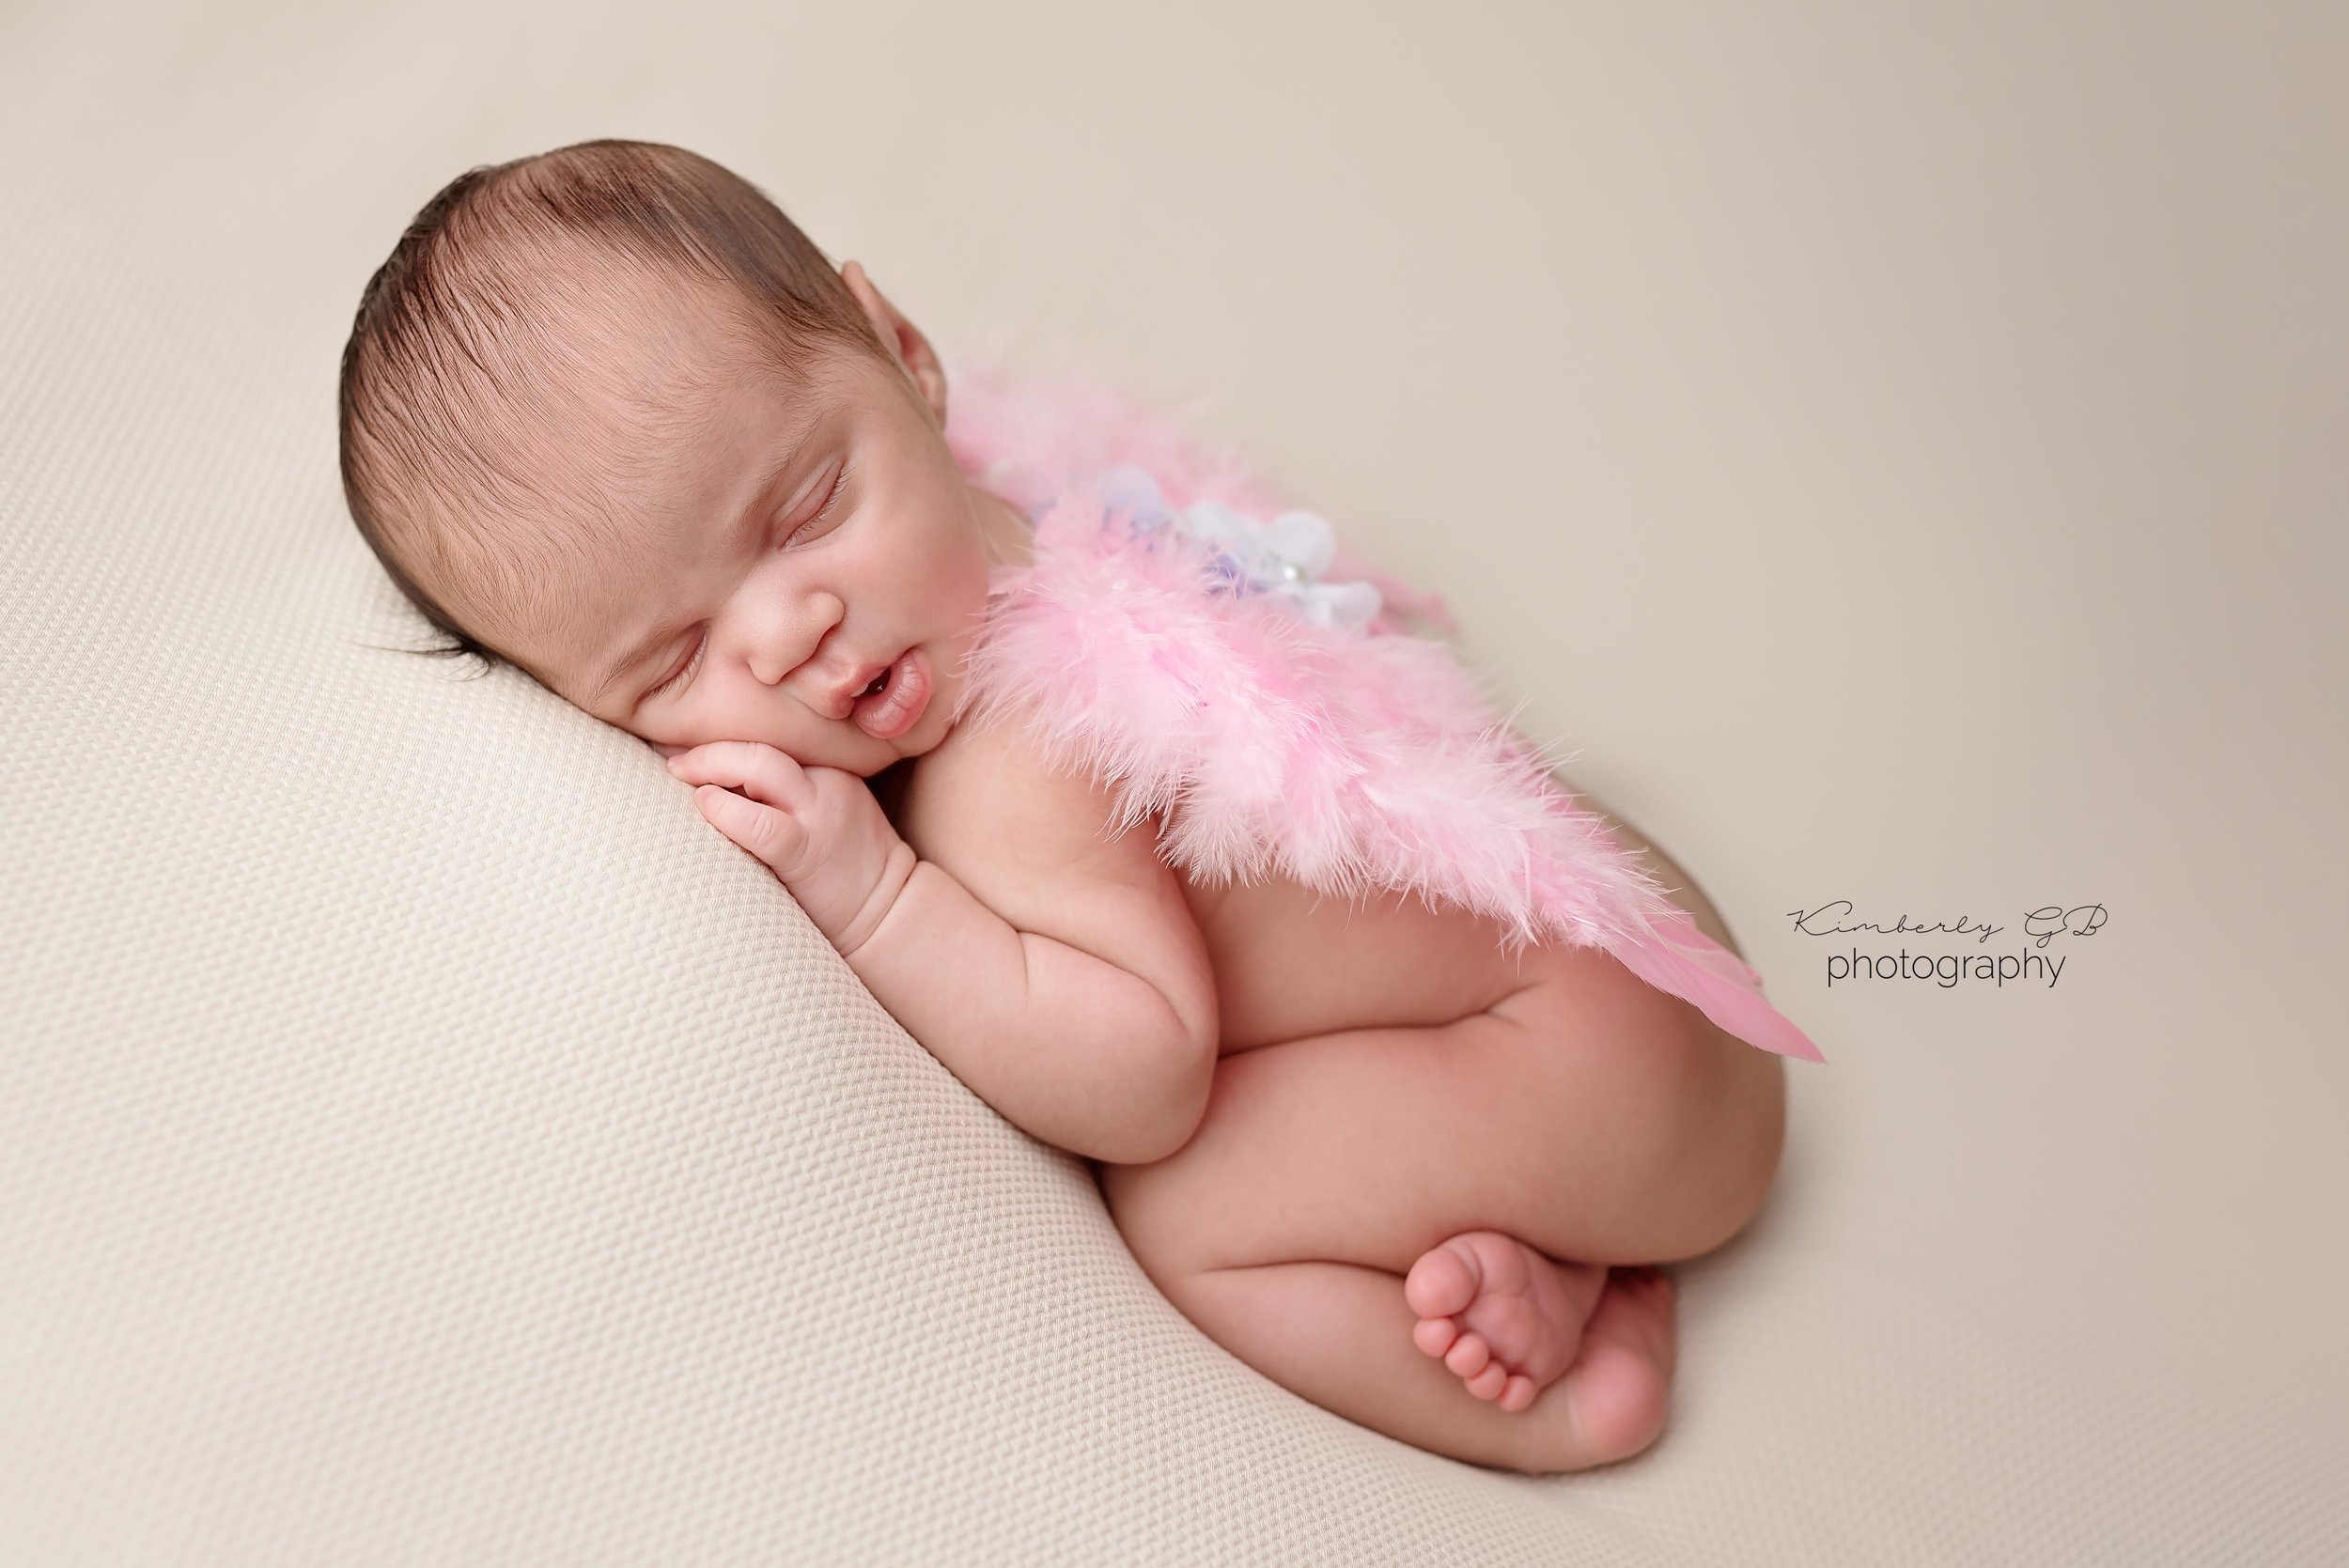 fotografia-de-recien-nacidos-bebes-newborn-en-puerto-rico-kimberly-gb-photography-fotografa-178.jpg